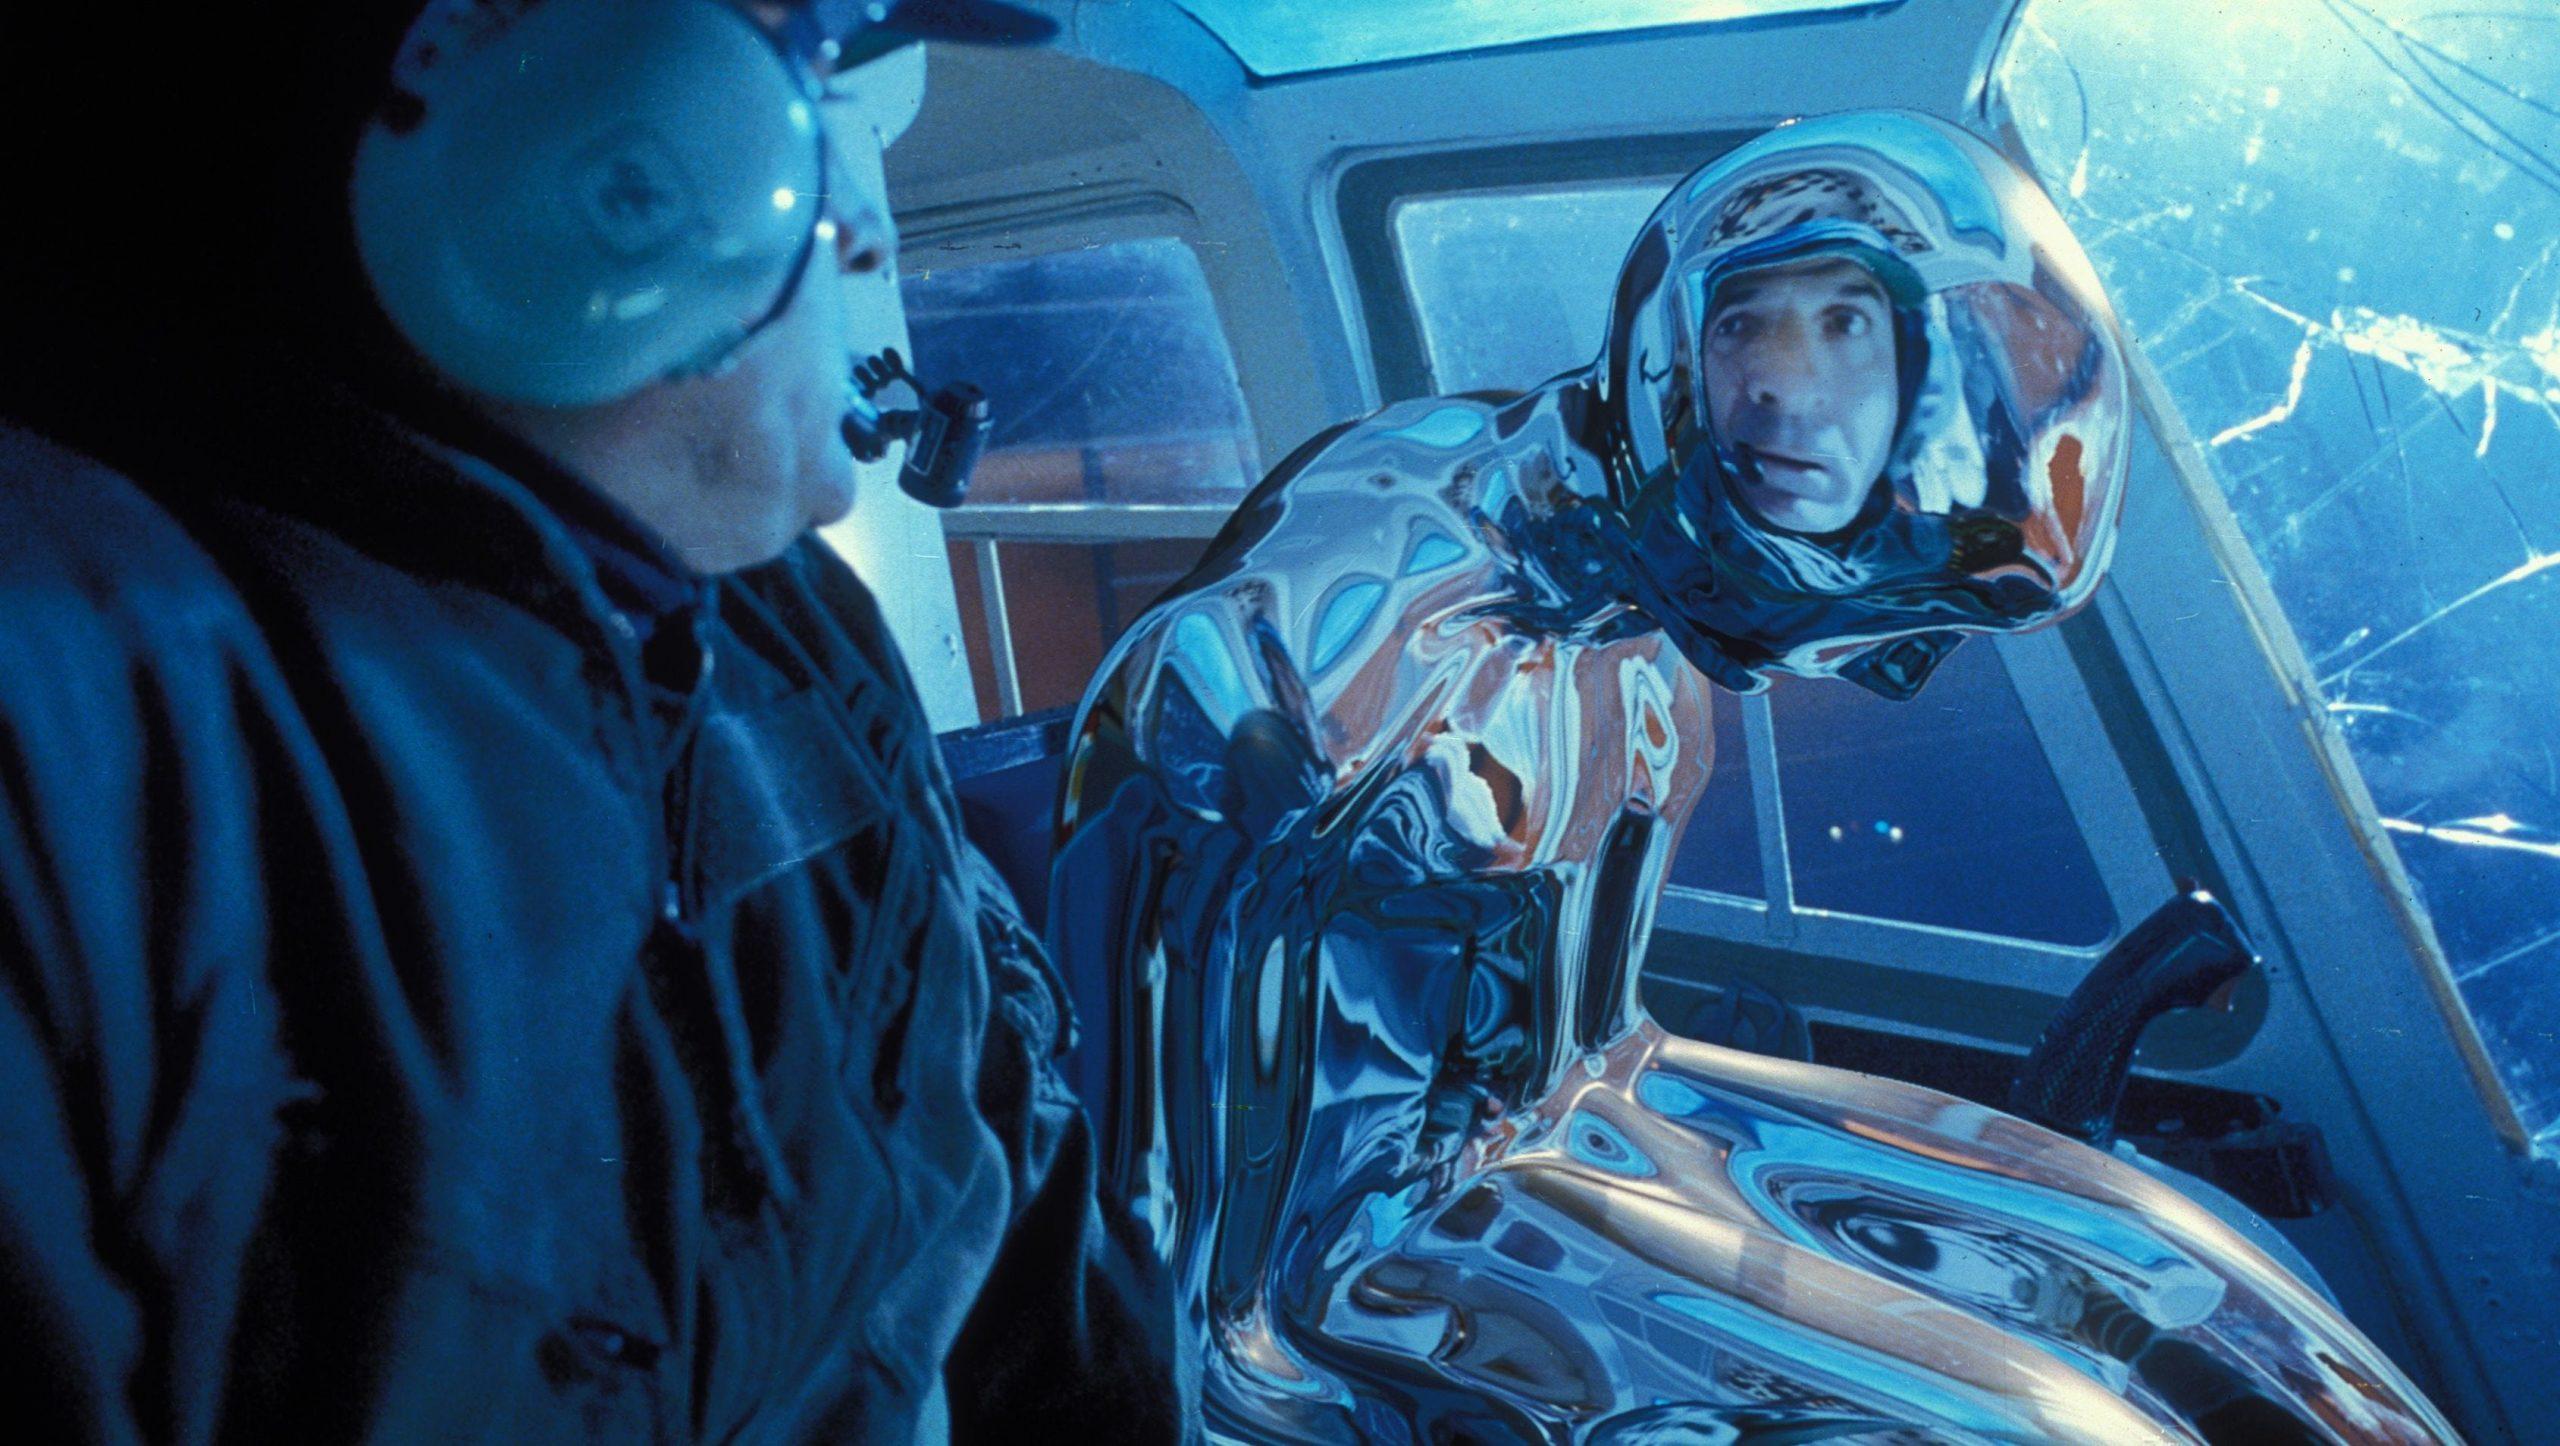 Terminator 2: Judgment Day T-1000 Liquid Metal